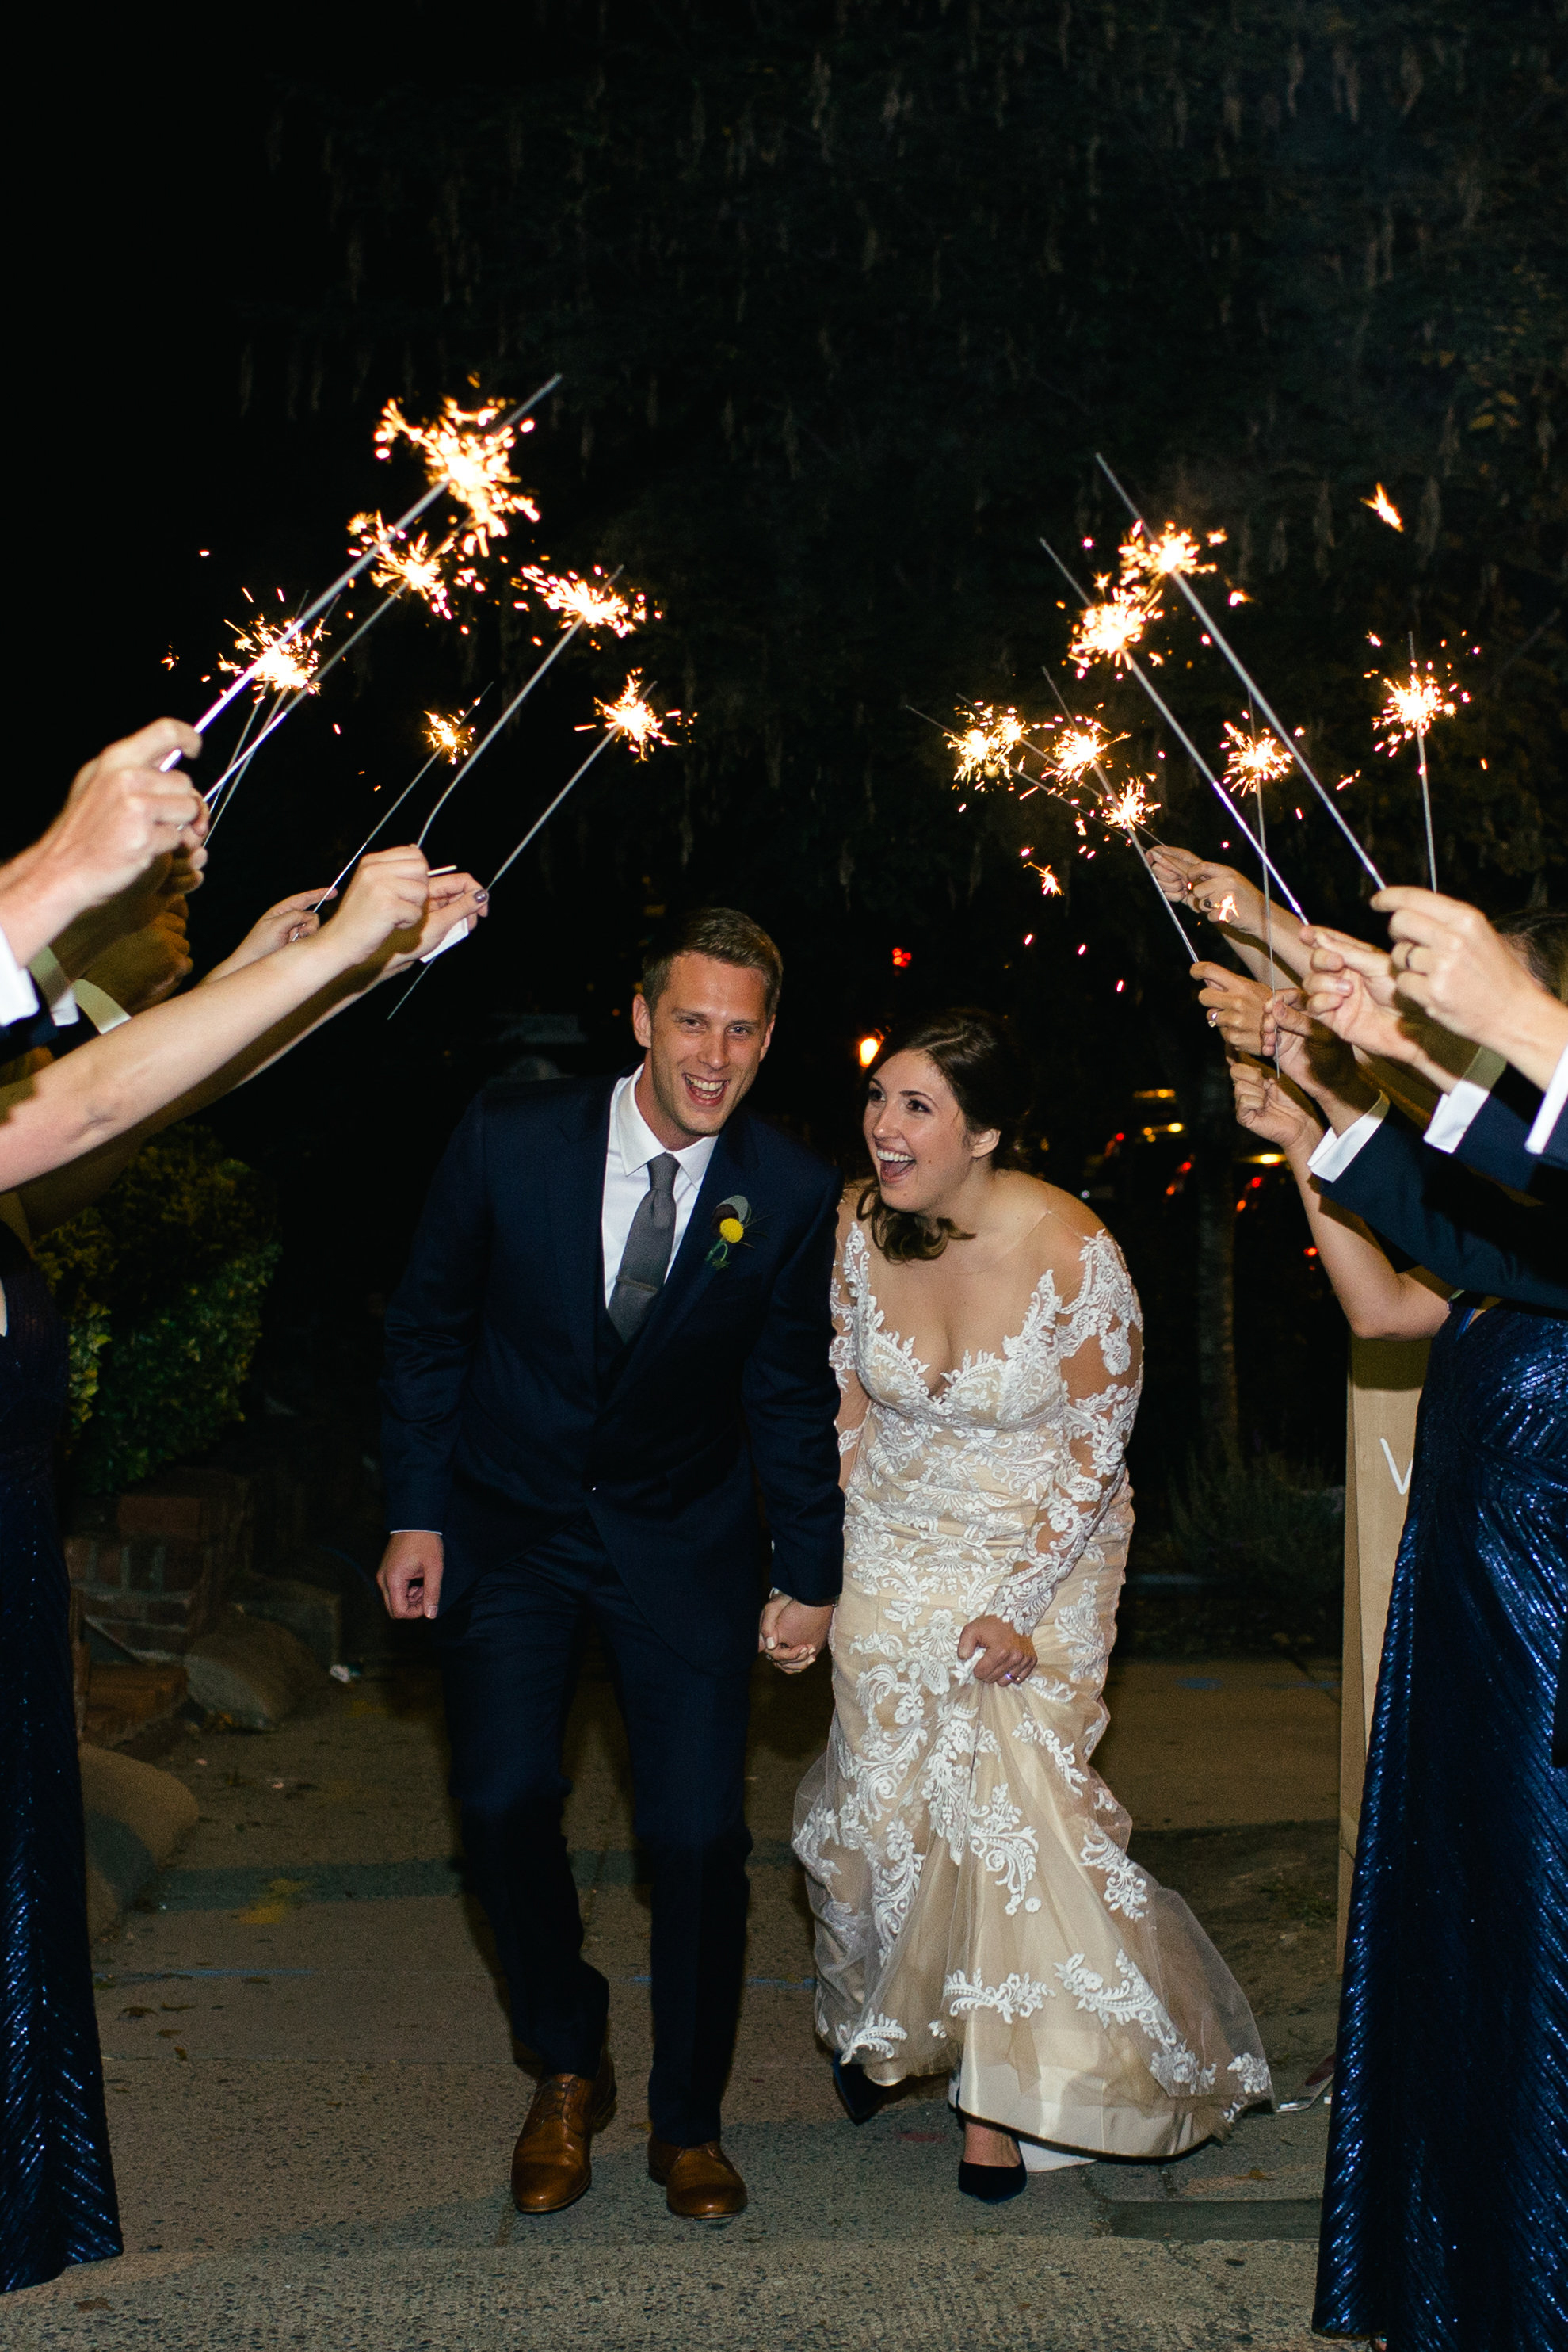 Dupon Circle Wedding | Washington DC Wedding Photography | Rebecca Wilcher Photography -39.jpg